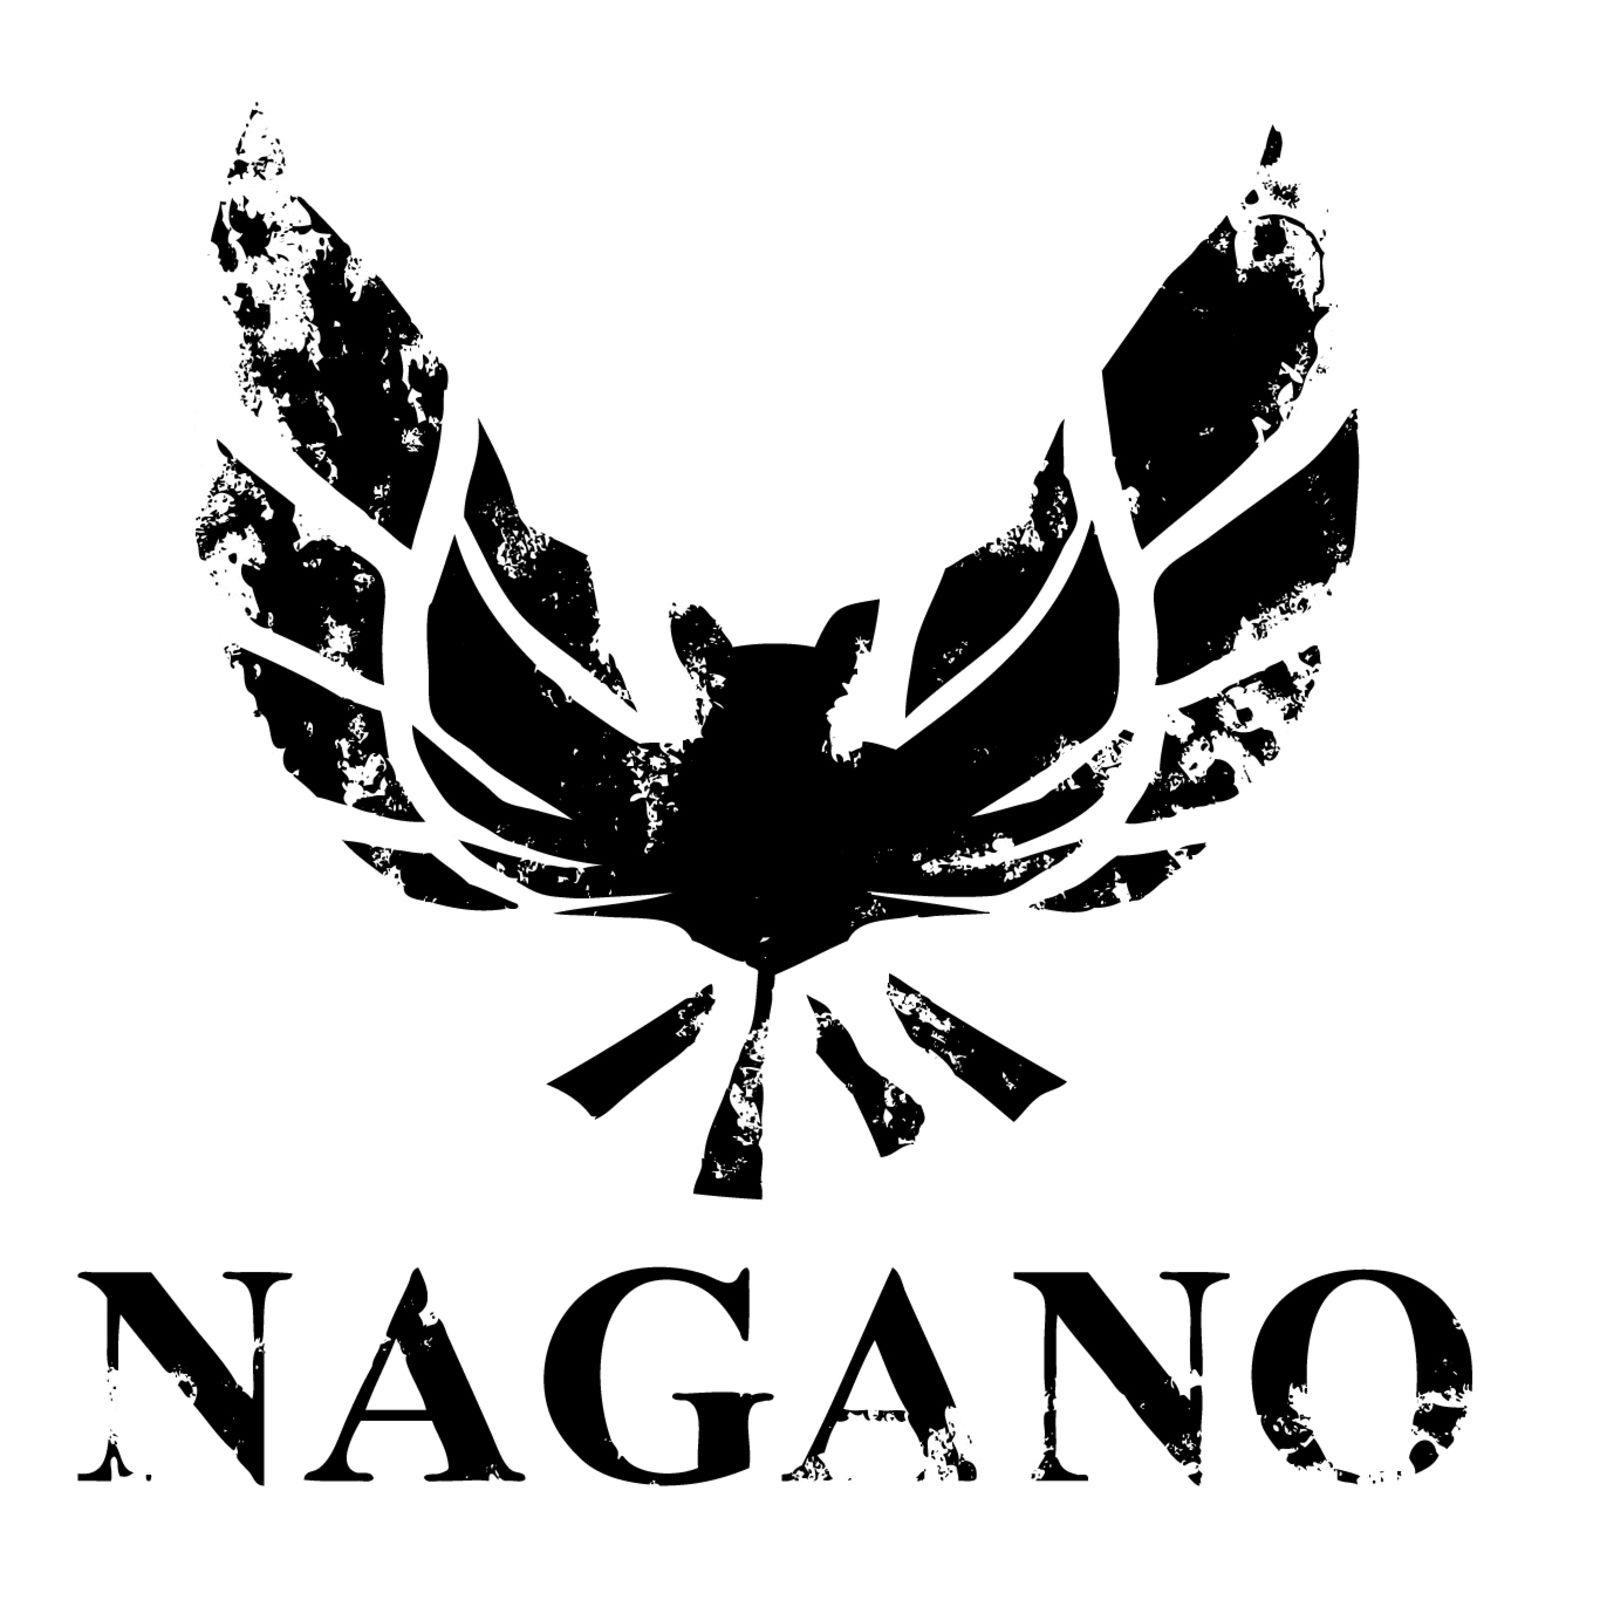 Nagano (Bild 1)